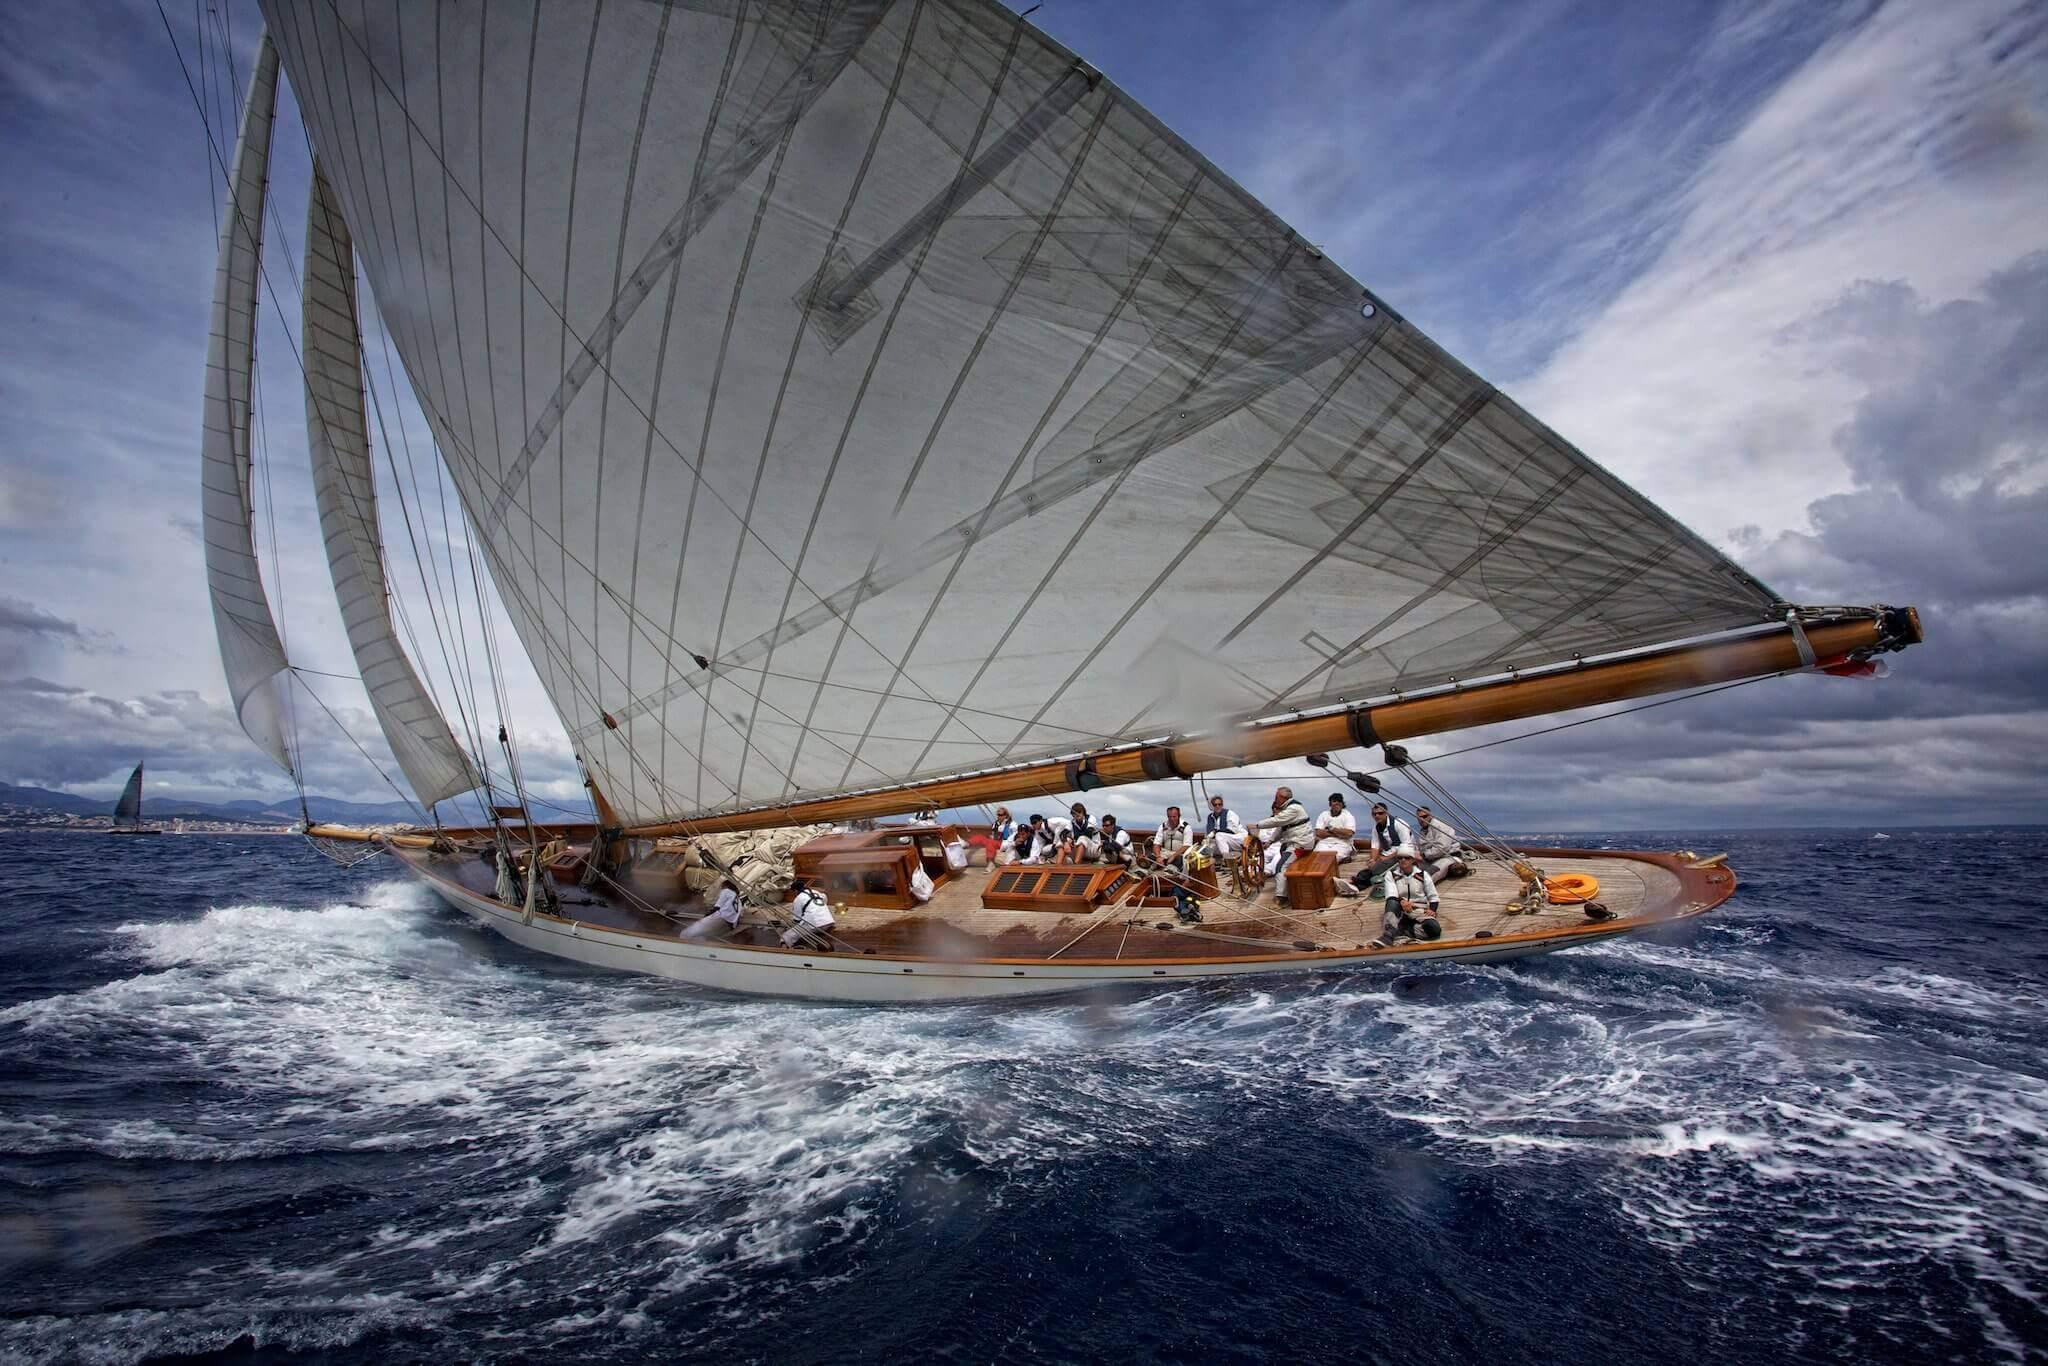 William Fife YACHT 105' - MOONBEAM IV Sailing Yacht Charter